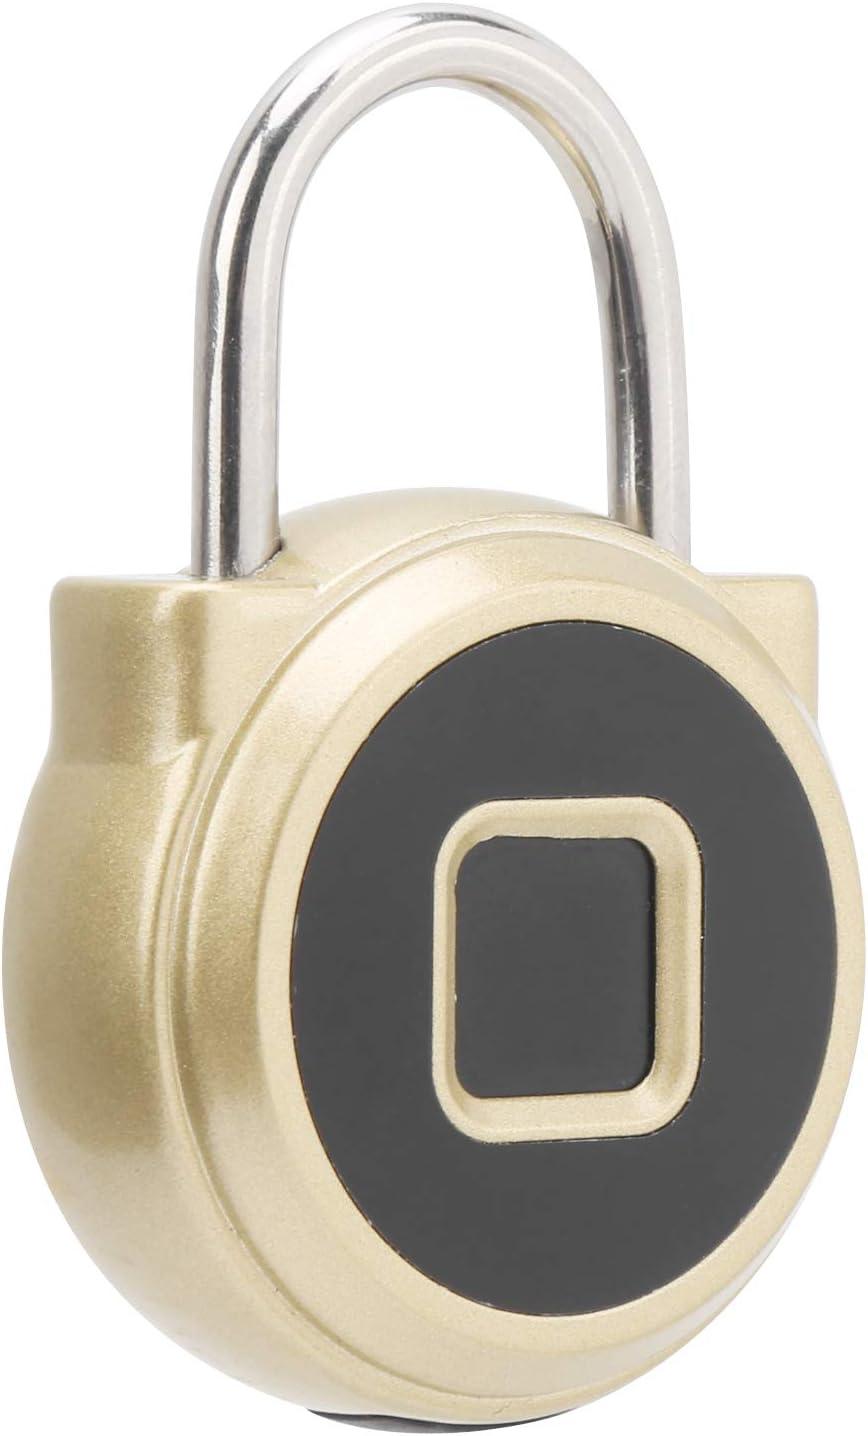 San Jose Mall Surprise price Labuduo Electronic Padlock High Fingerpri Anti‑Theft Strength